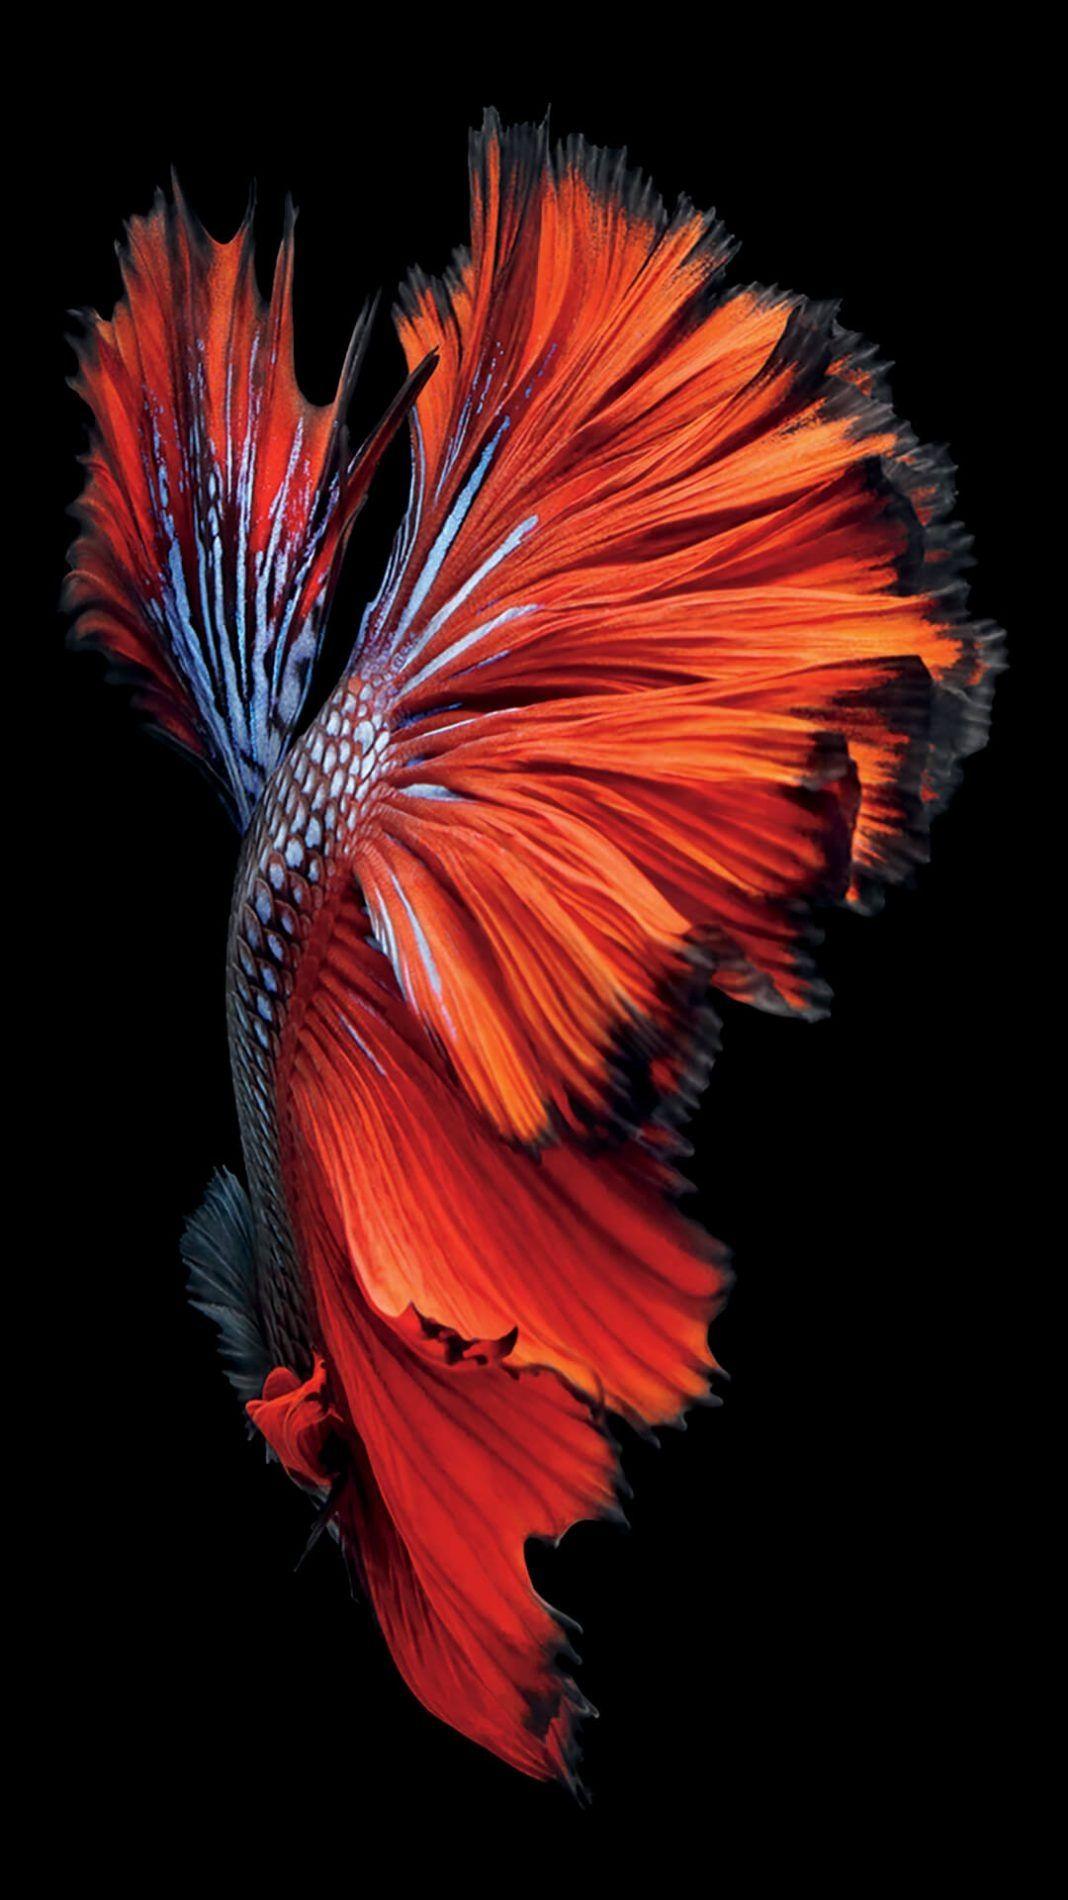 Fish Clean iPhone home screen wallpaper